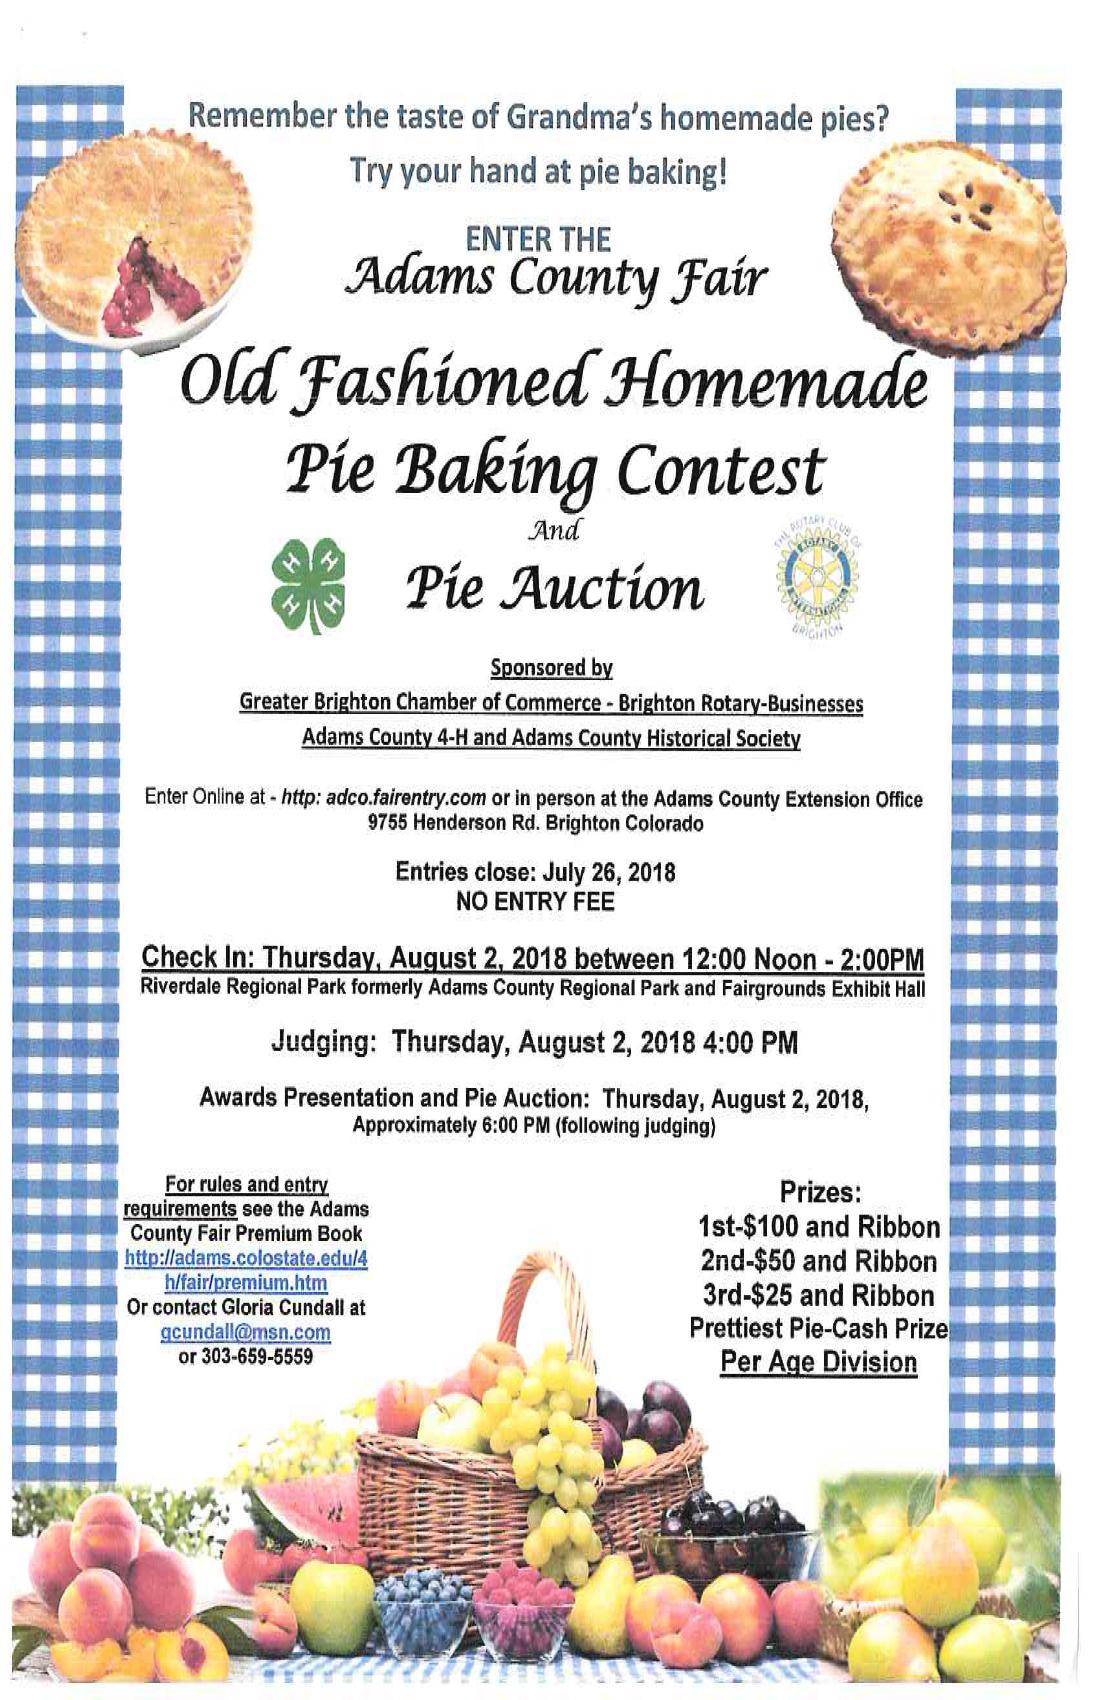 Homemade Pie Baking Contest | Rotary Club of Brighton